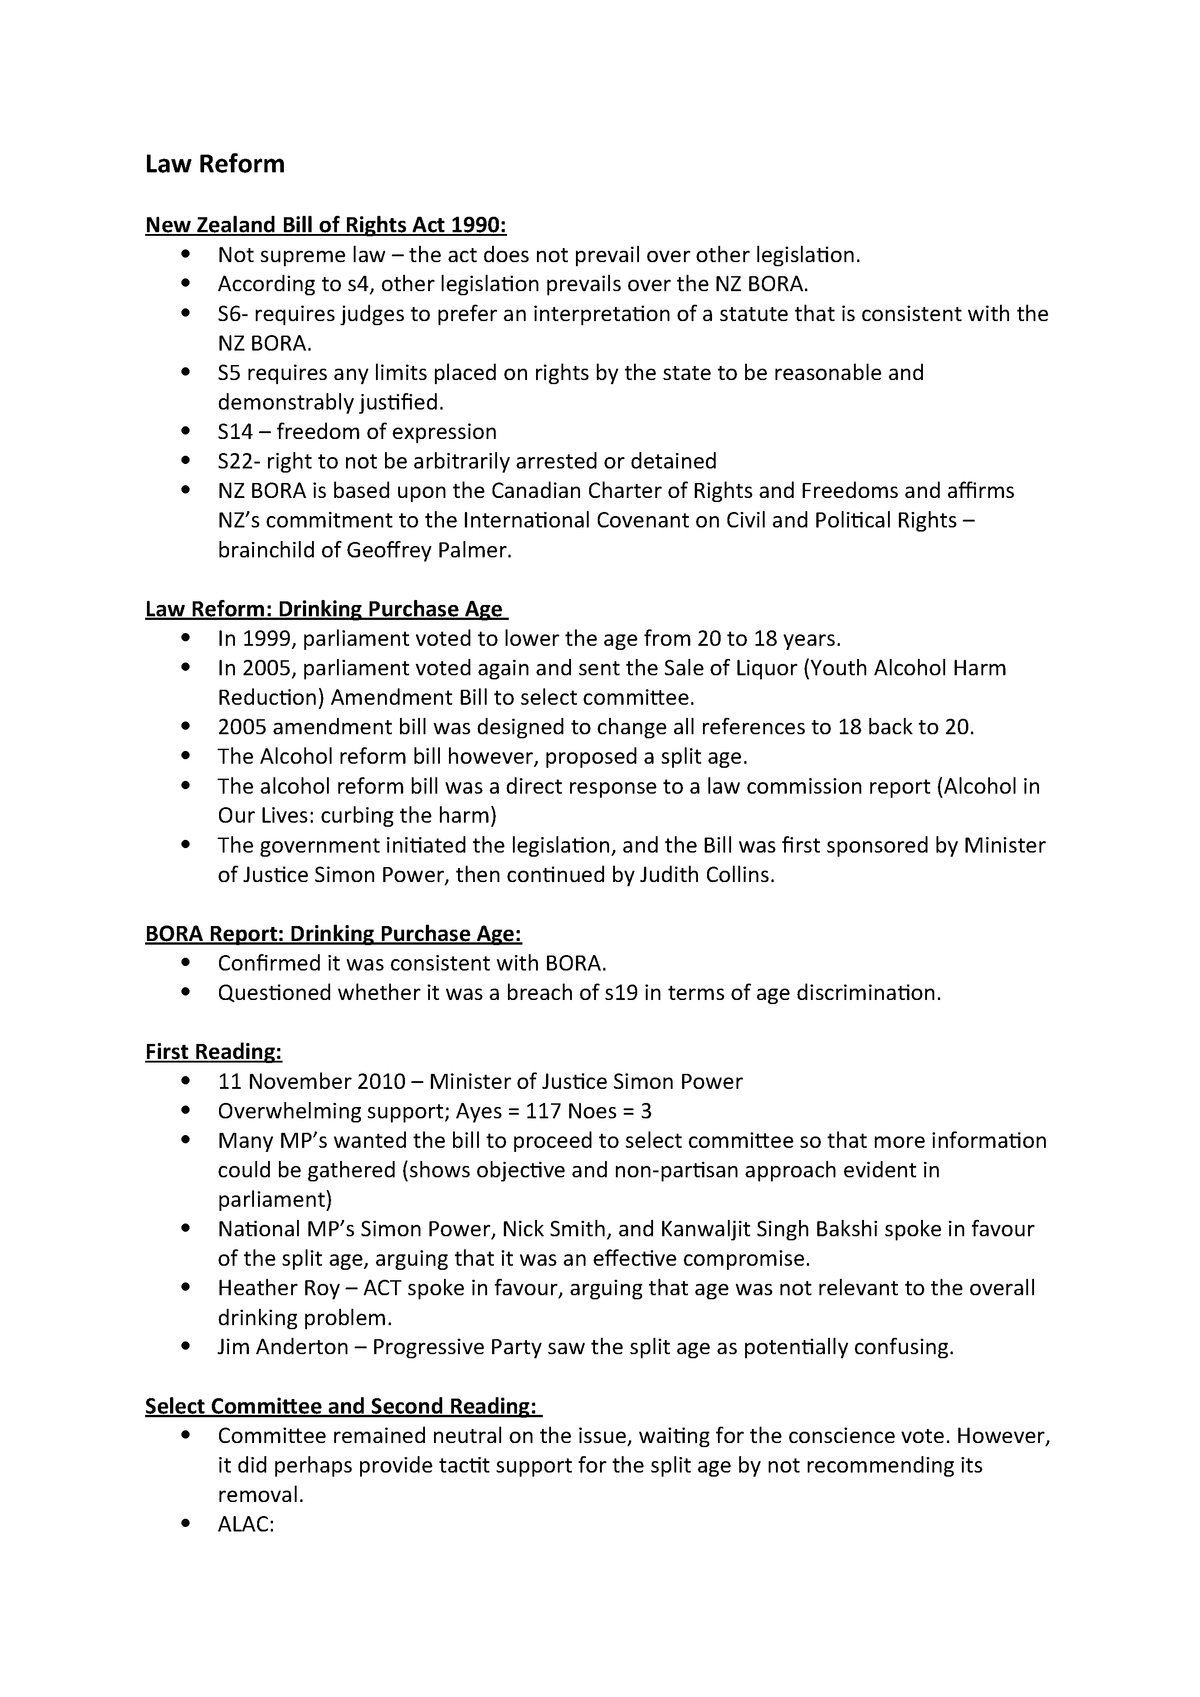 LAWS 121 - Exam Notes - LAWS121 - Victoria University - StuDocu